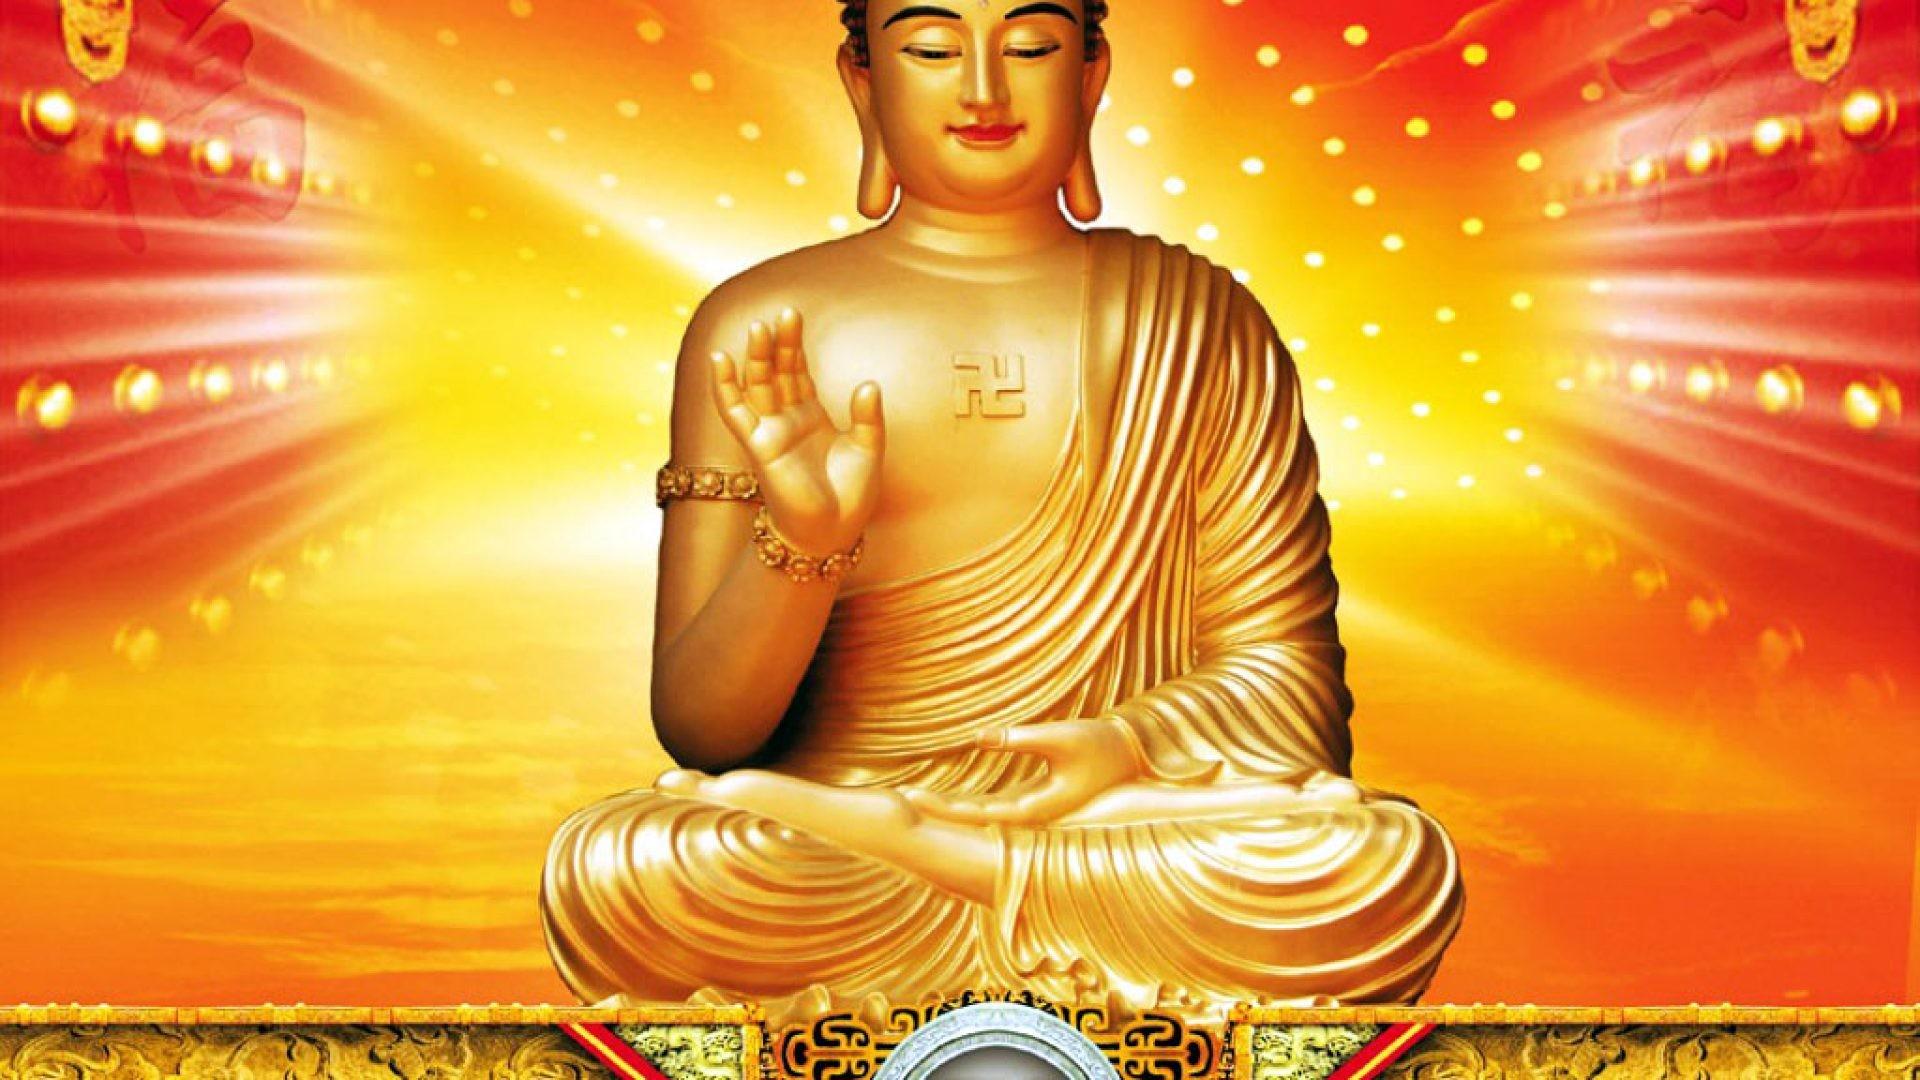 Chinese Buddha Wallpapers